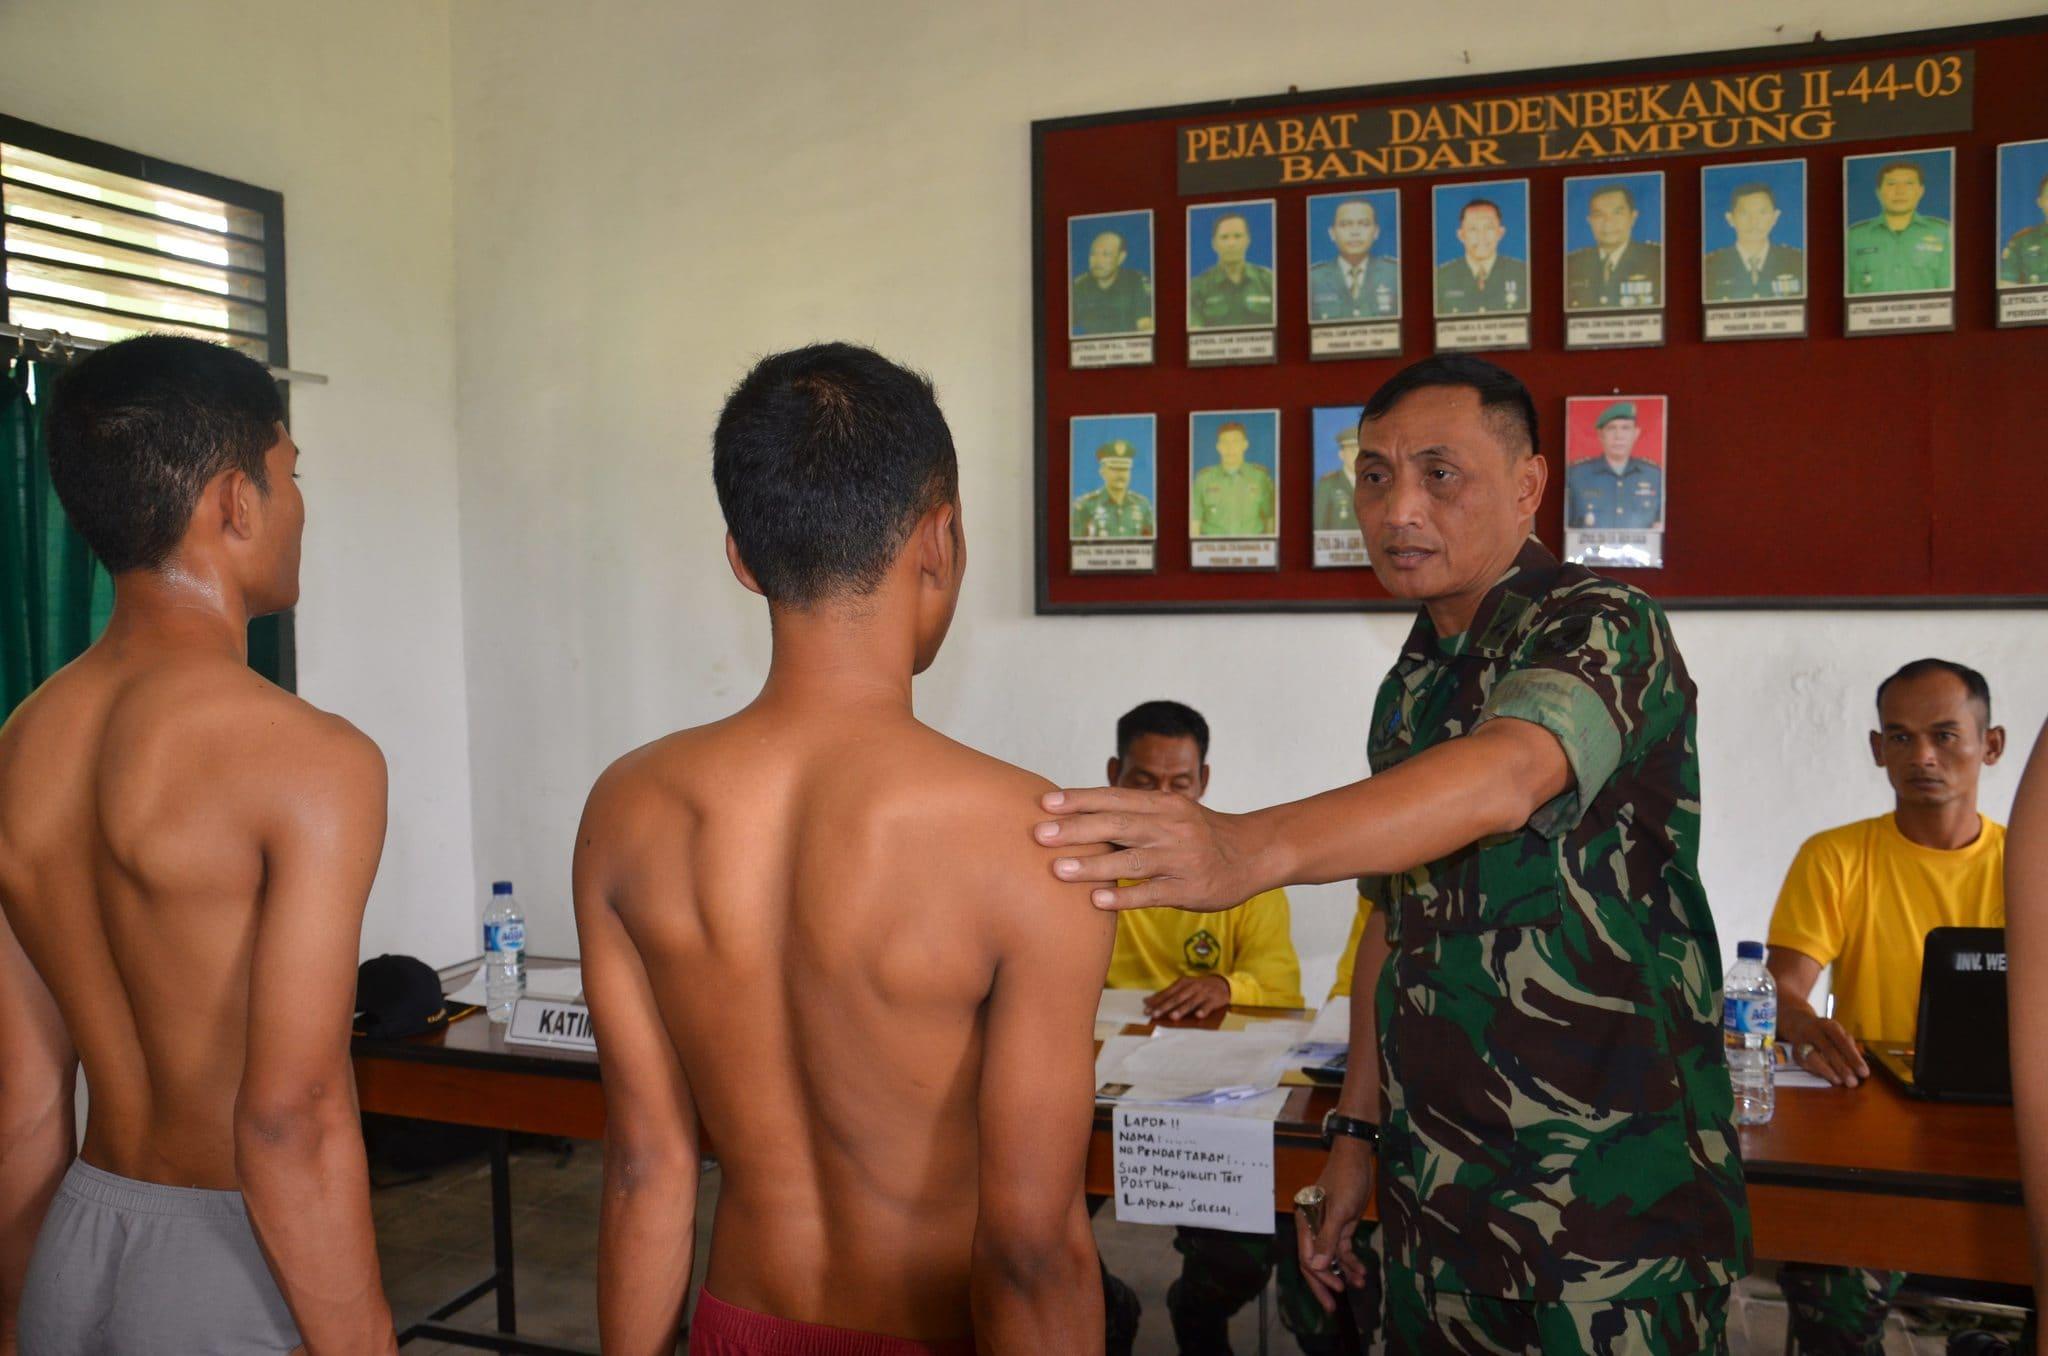 DANREM 043/GATAM TINJAU SELEKSI CEK AWAL CALON TAMTAMAPK TNI AD GELOMBANG II SUB PANDA LAMPUNG.